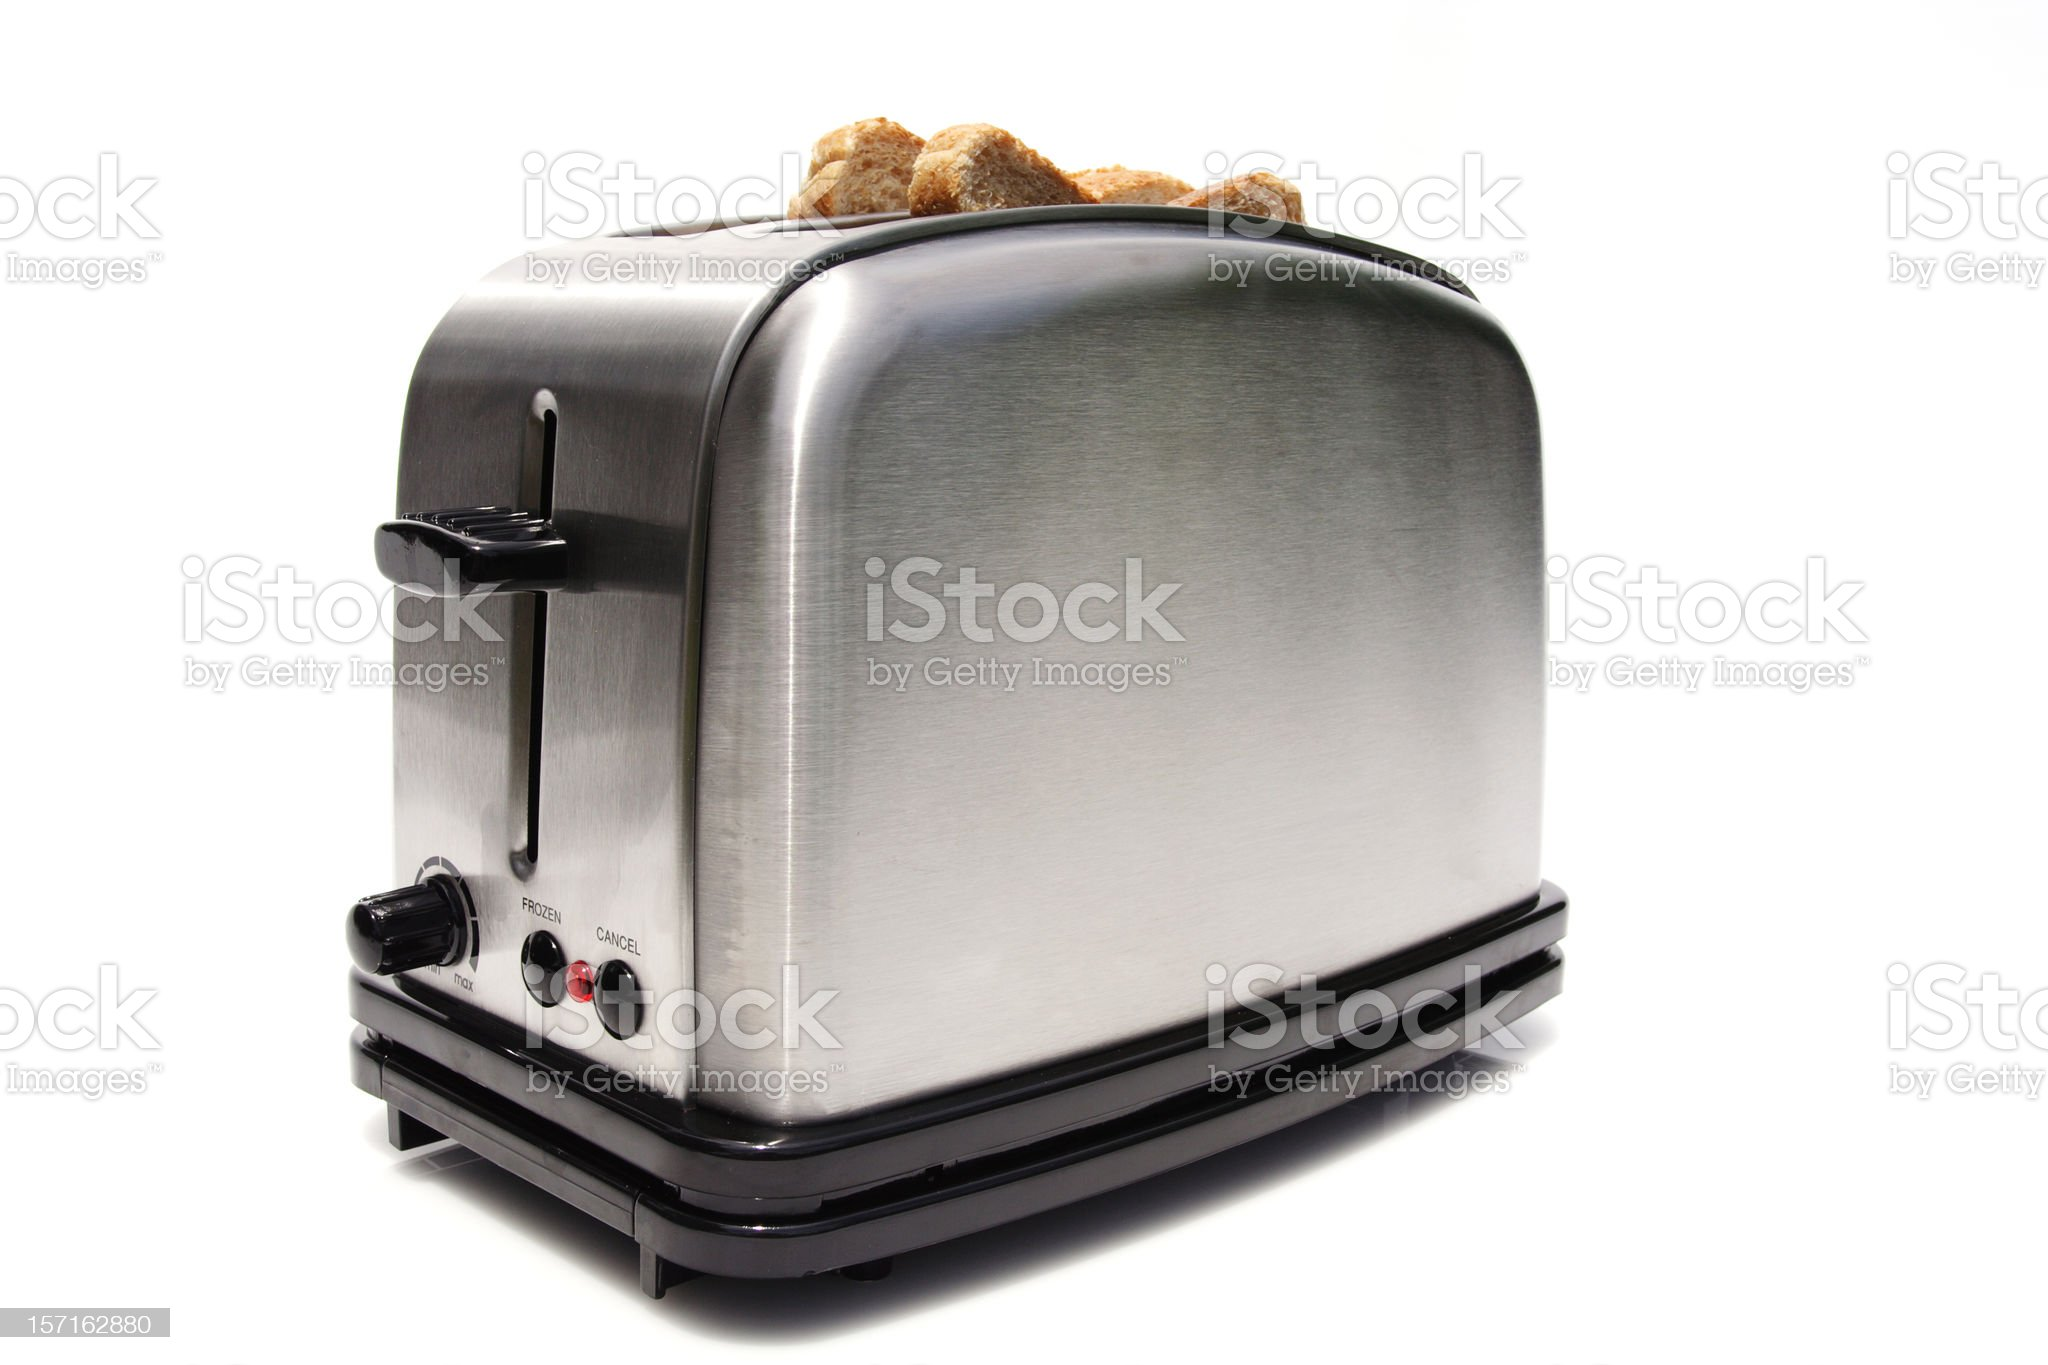 brand new modern toaster royalty-free stock photo